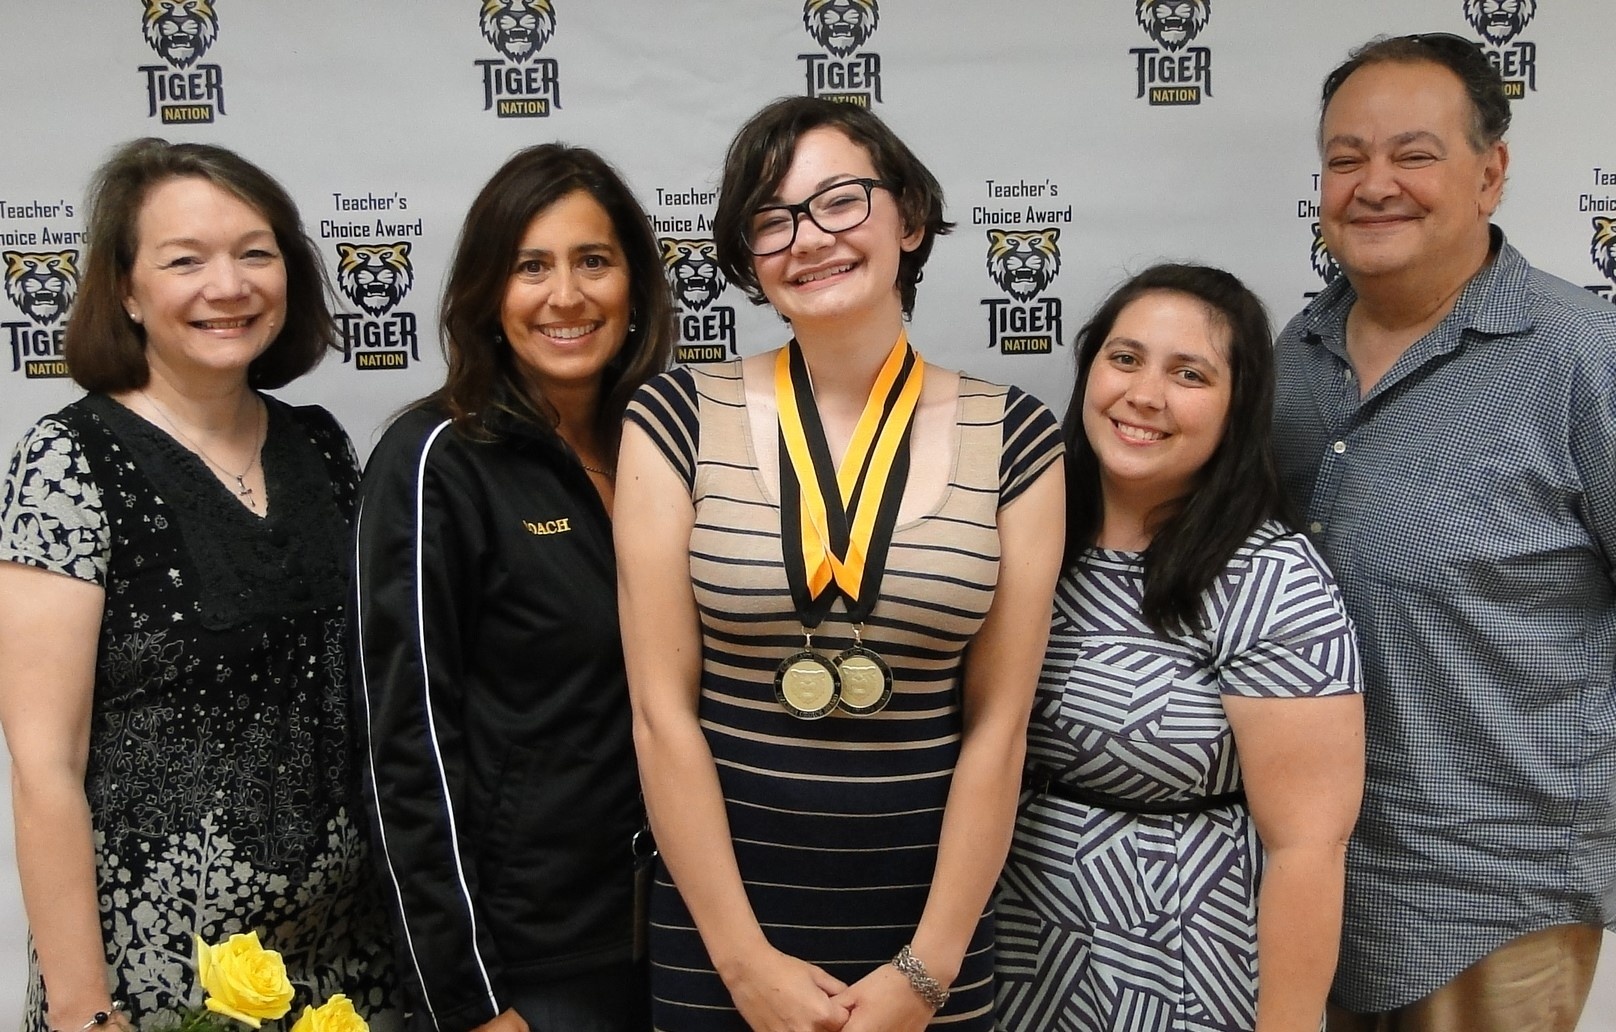 Gilda Weinstock recognized by Mrs. McDonald & Ms. Eisenberg